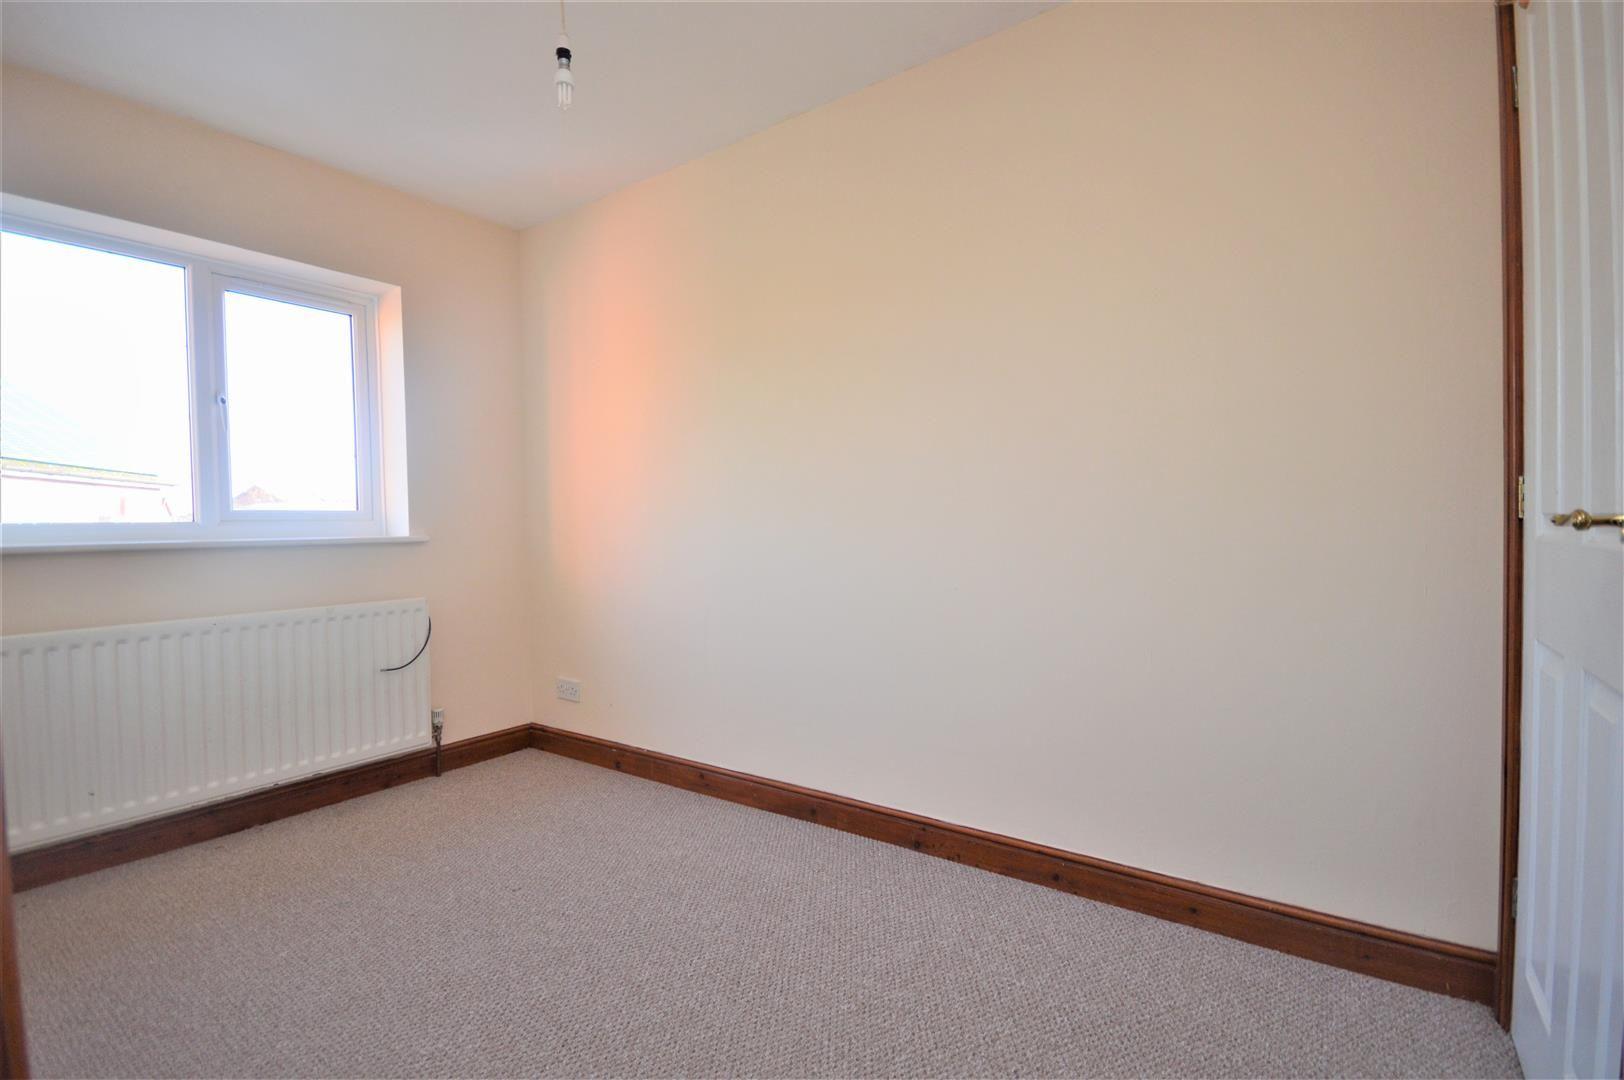 2 bed terraced for sale in Lower Bullingham 8